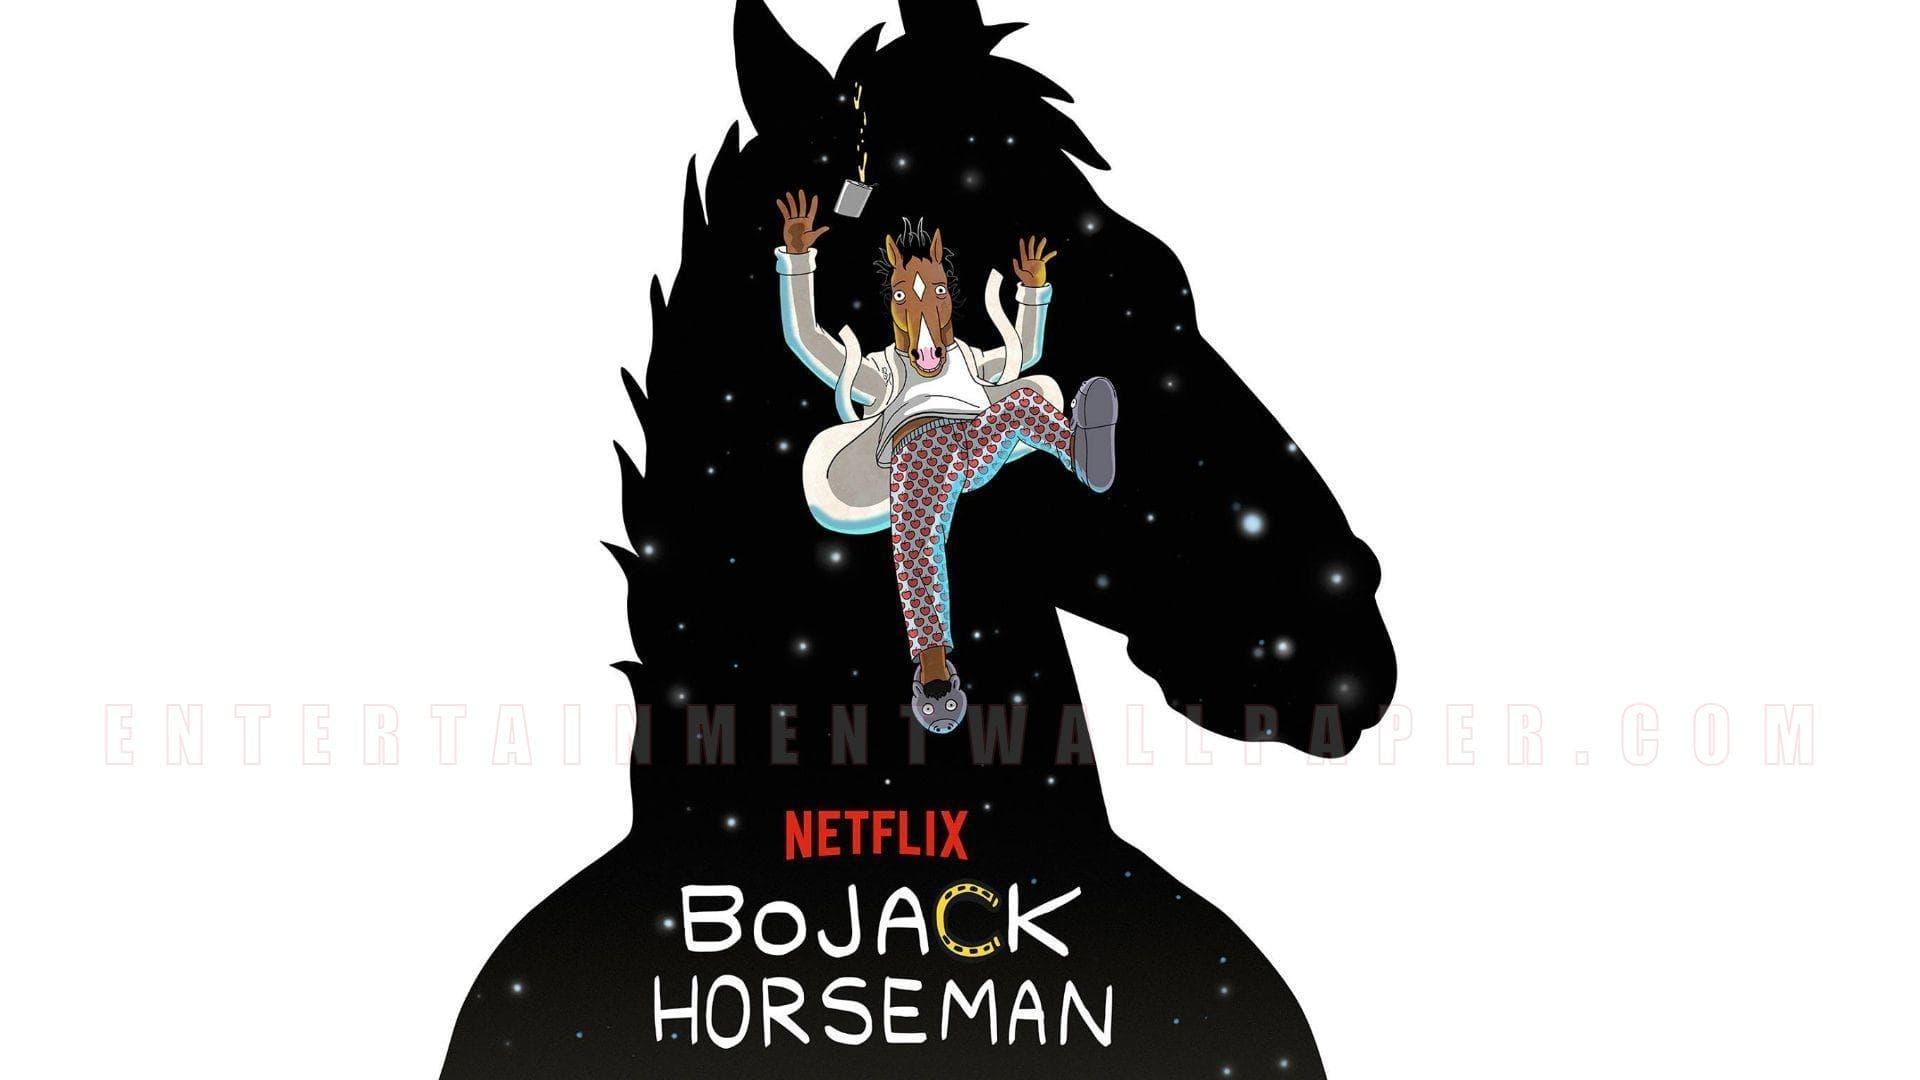 BoJack Horseman - Season 1